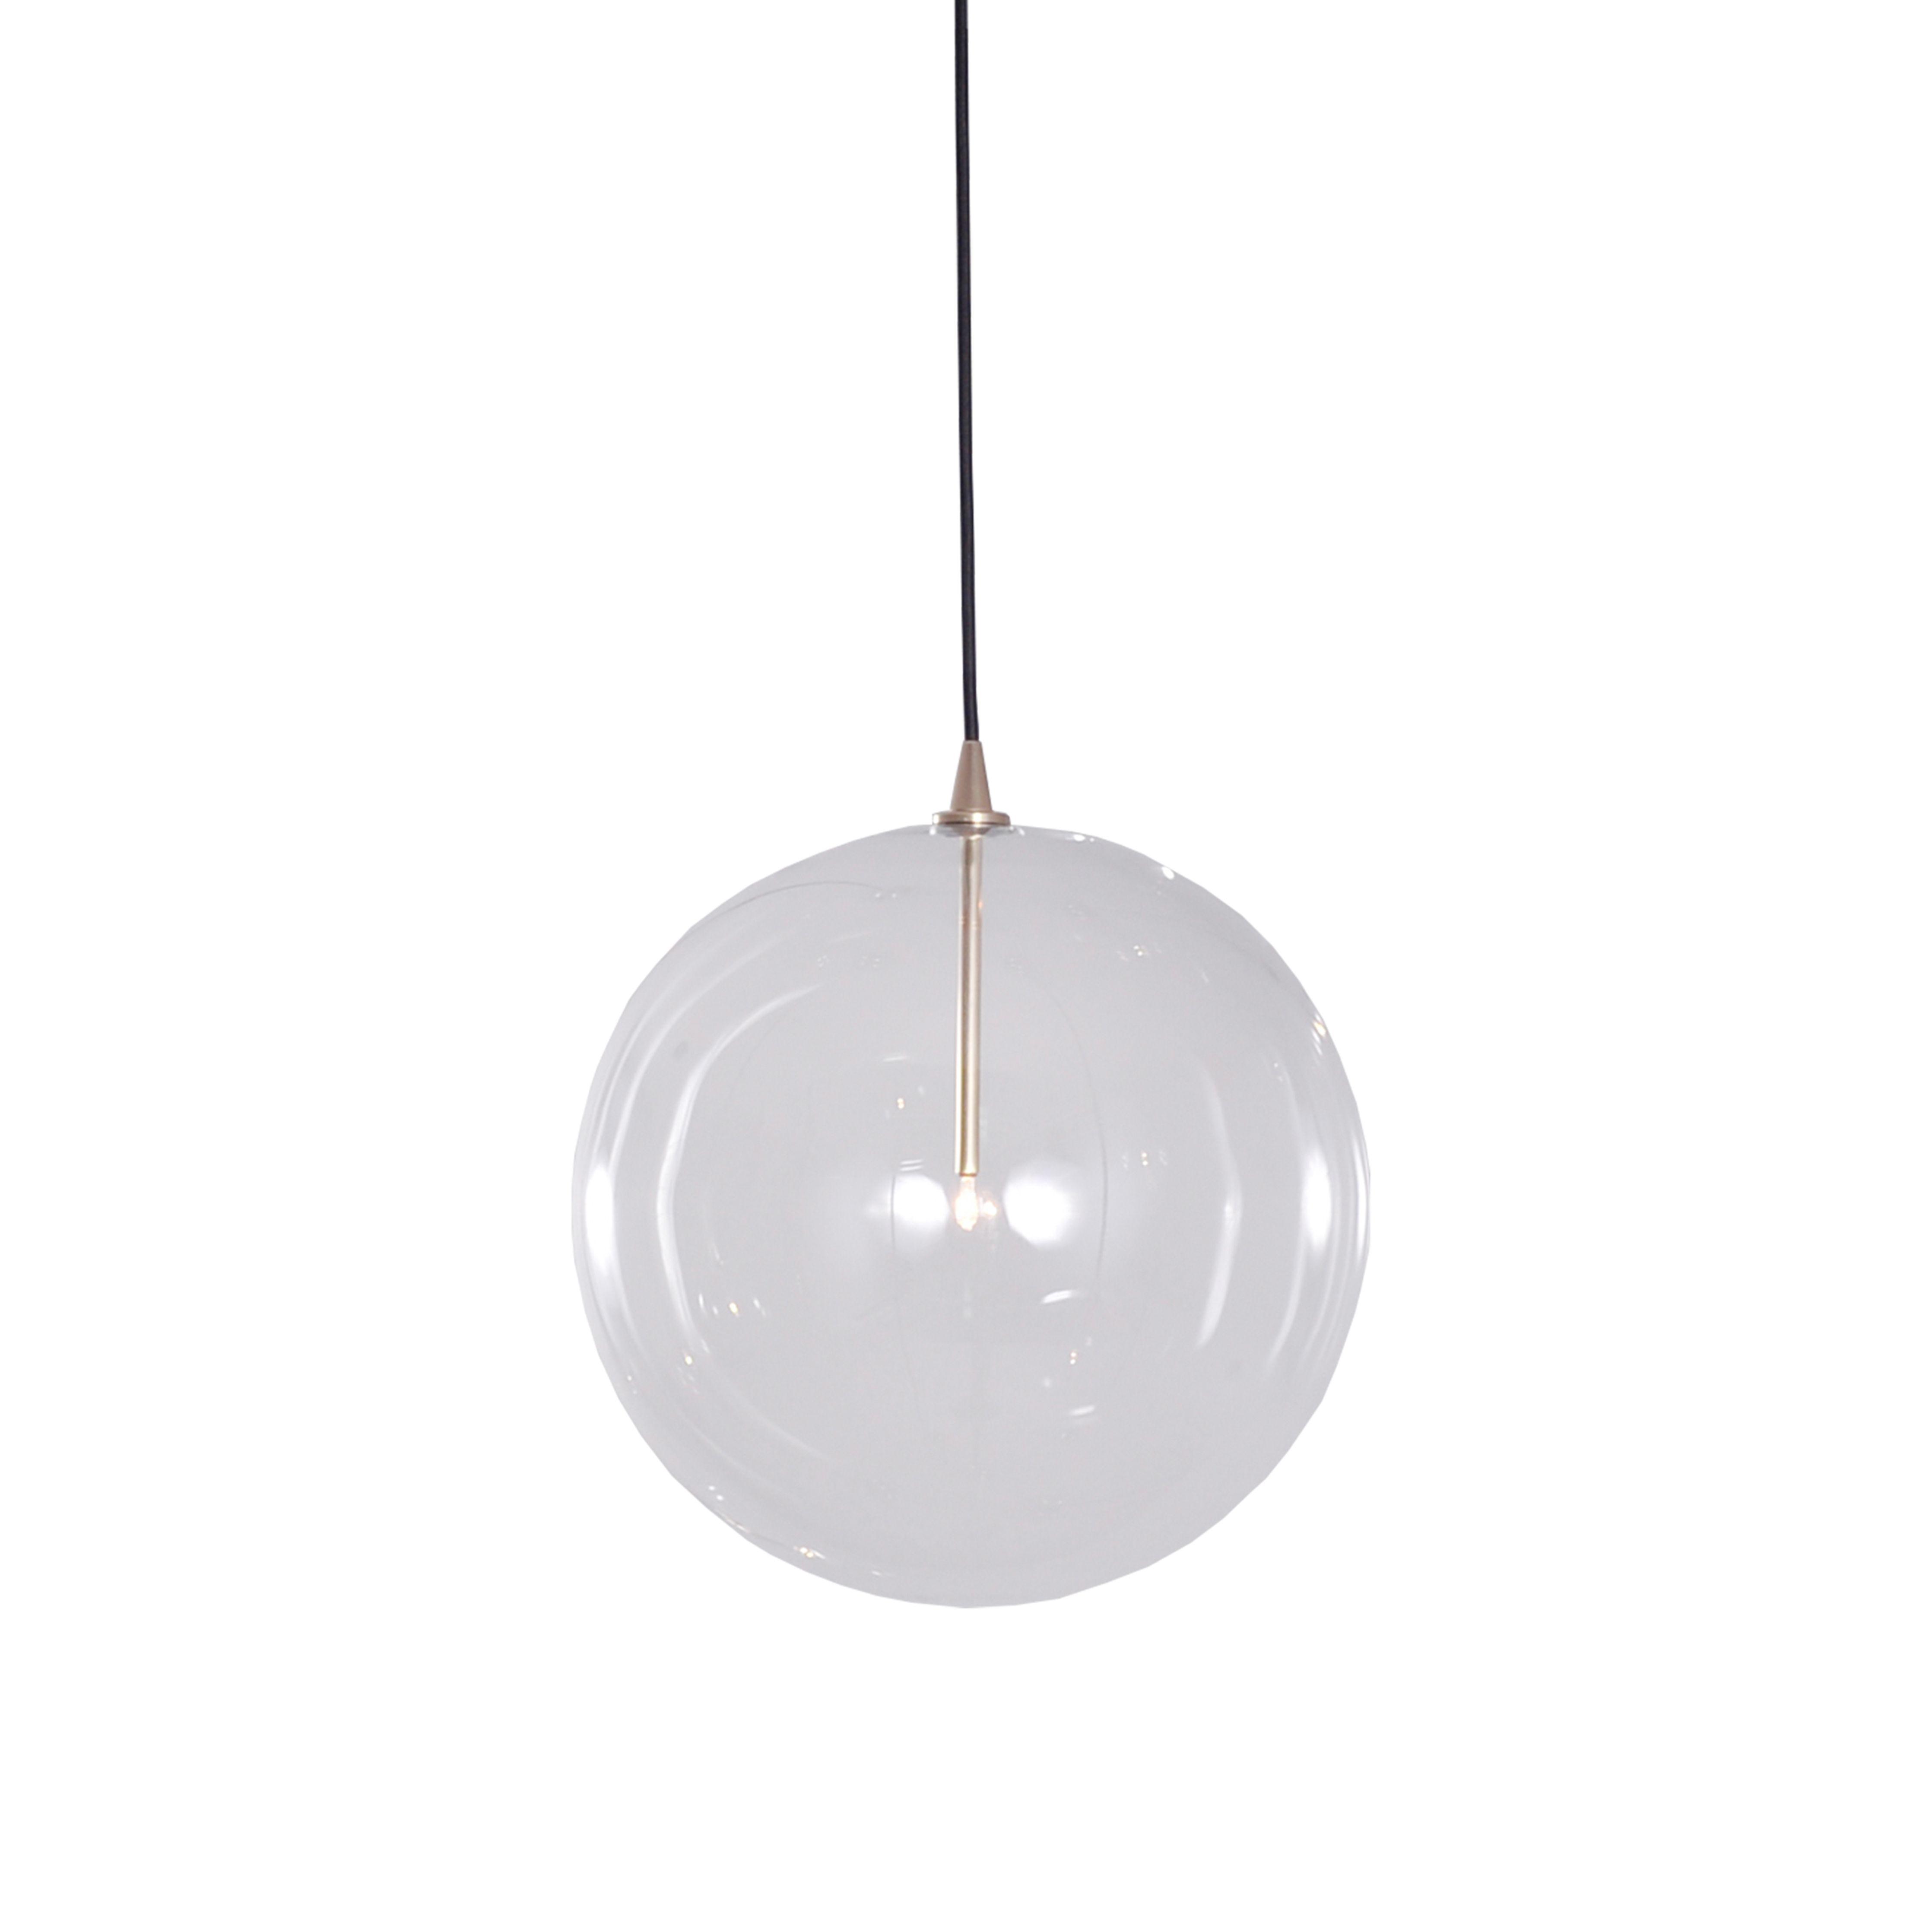 Glass Globe Pendant 250 By Schwung Home On Ecc Glass Globe Pendant Glass Globe Globe Pendant